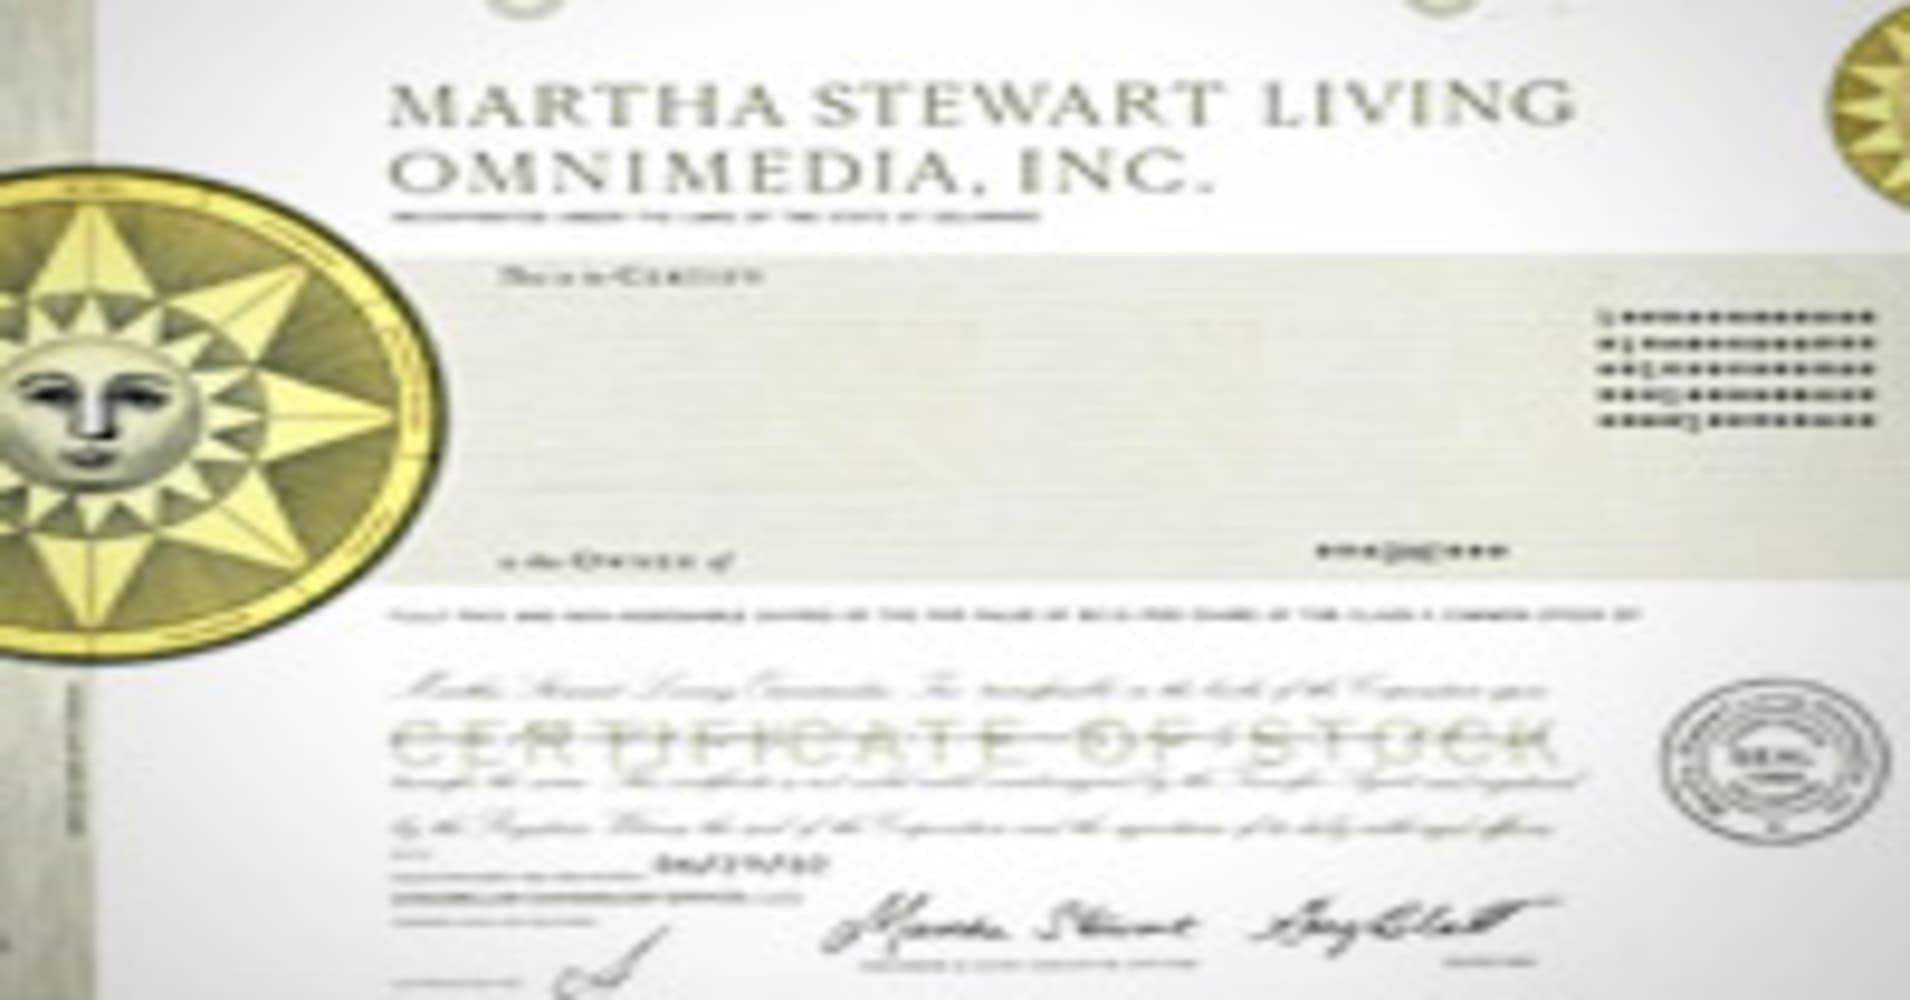 A New Facebook Derivative Trade The Stock Certificate